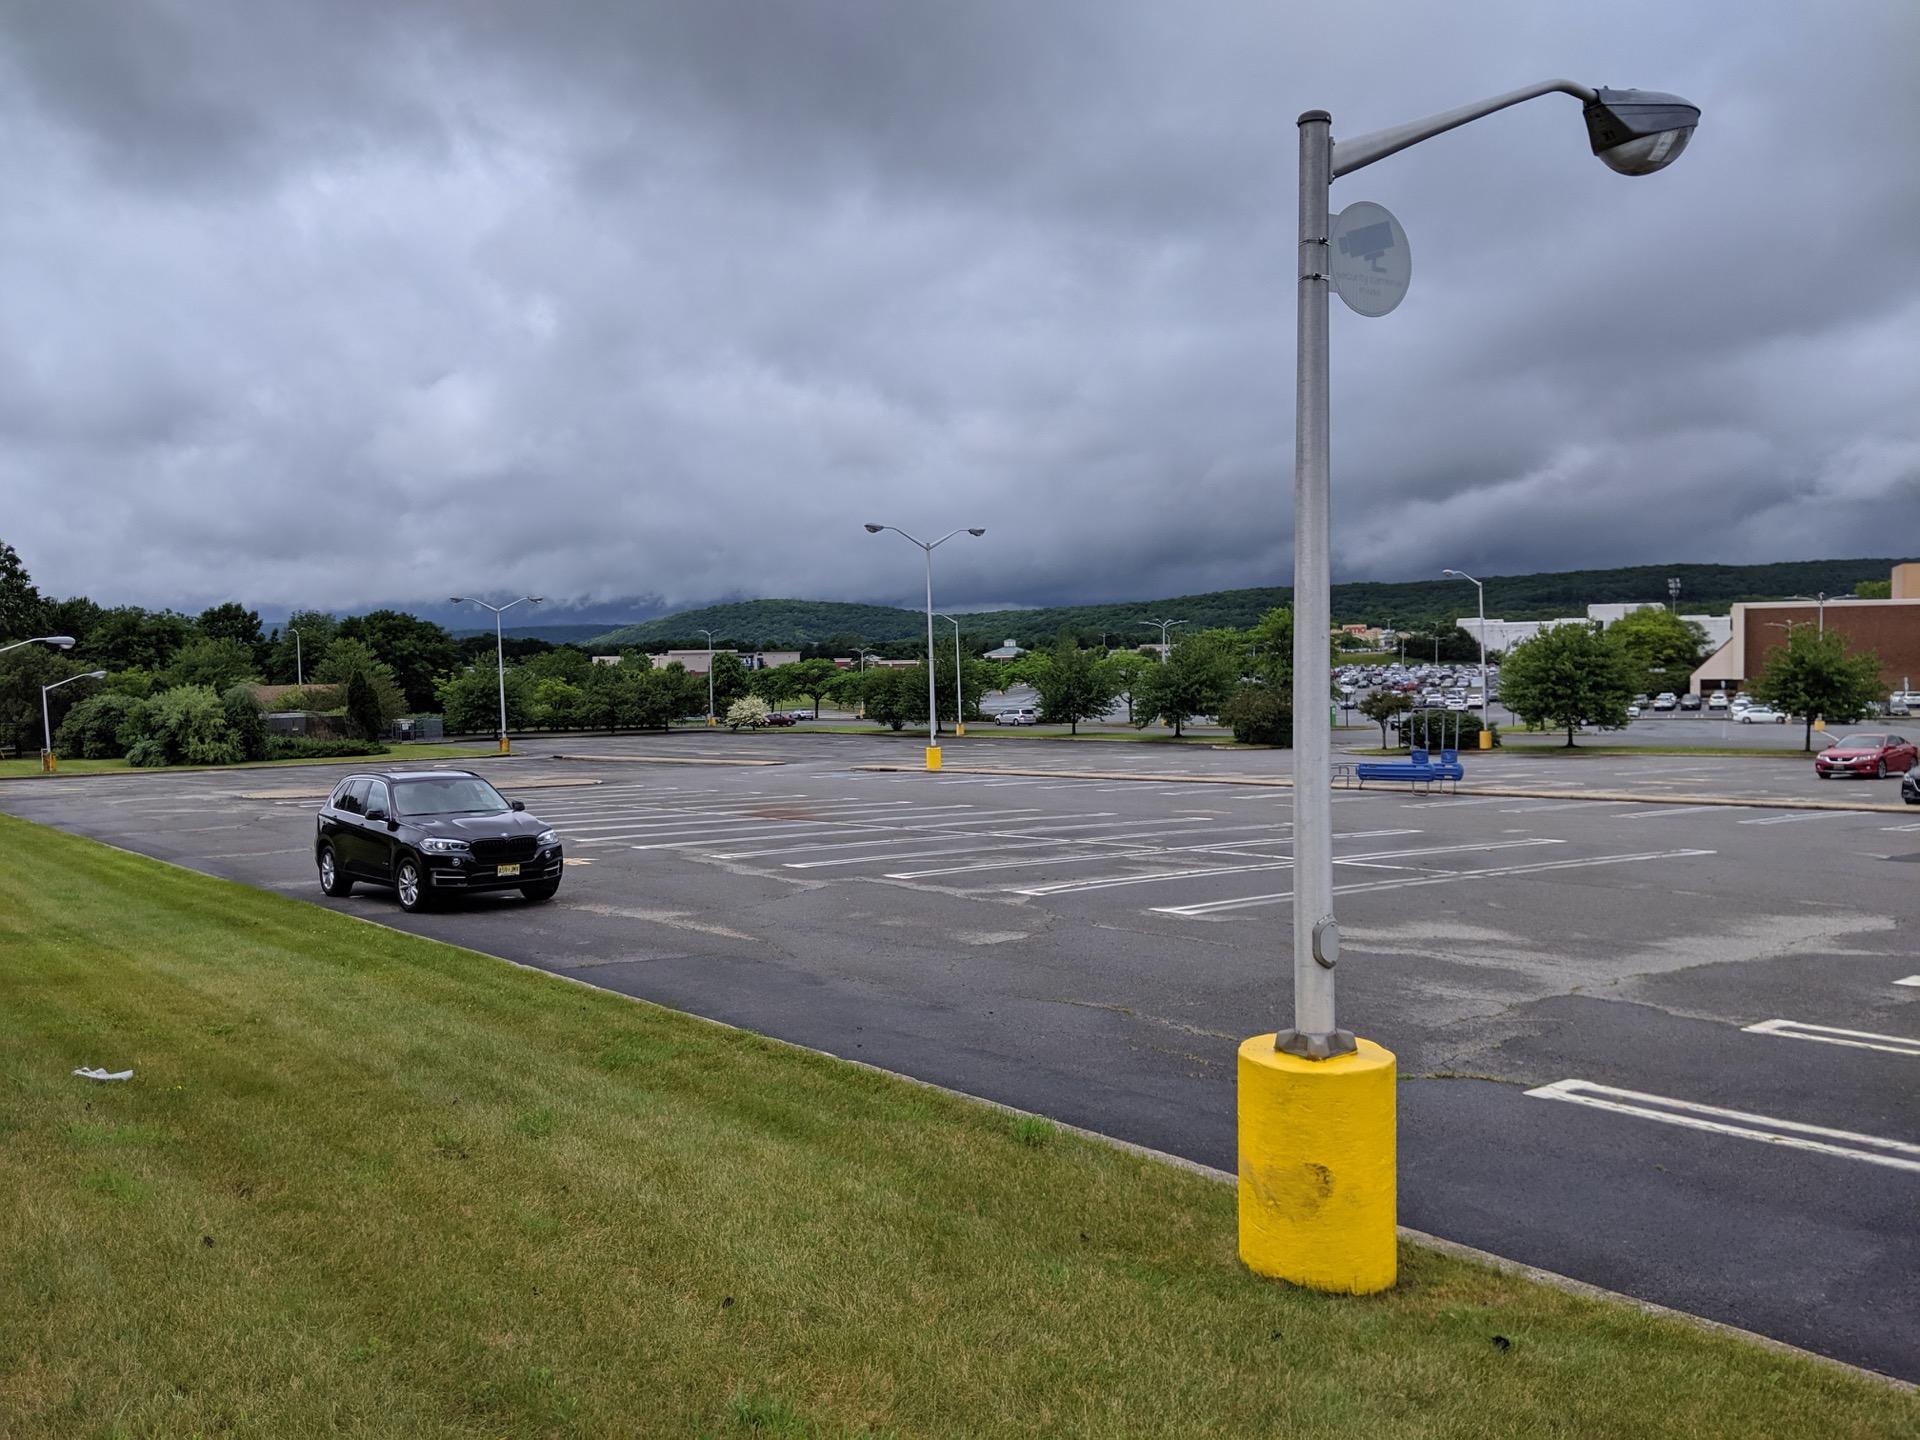 Google Pixel 3a XL Camera Review Landscape lamp and car